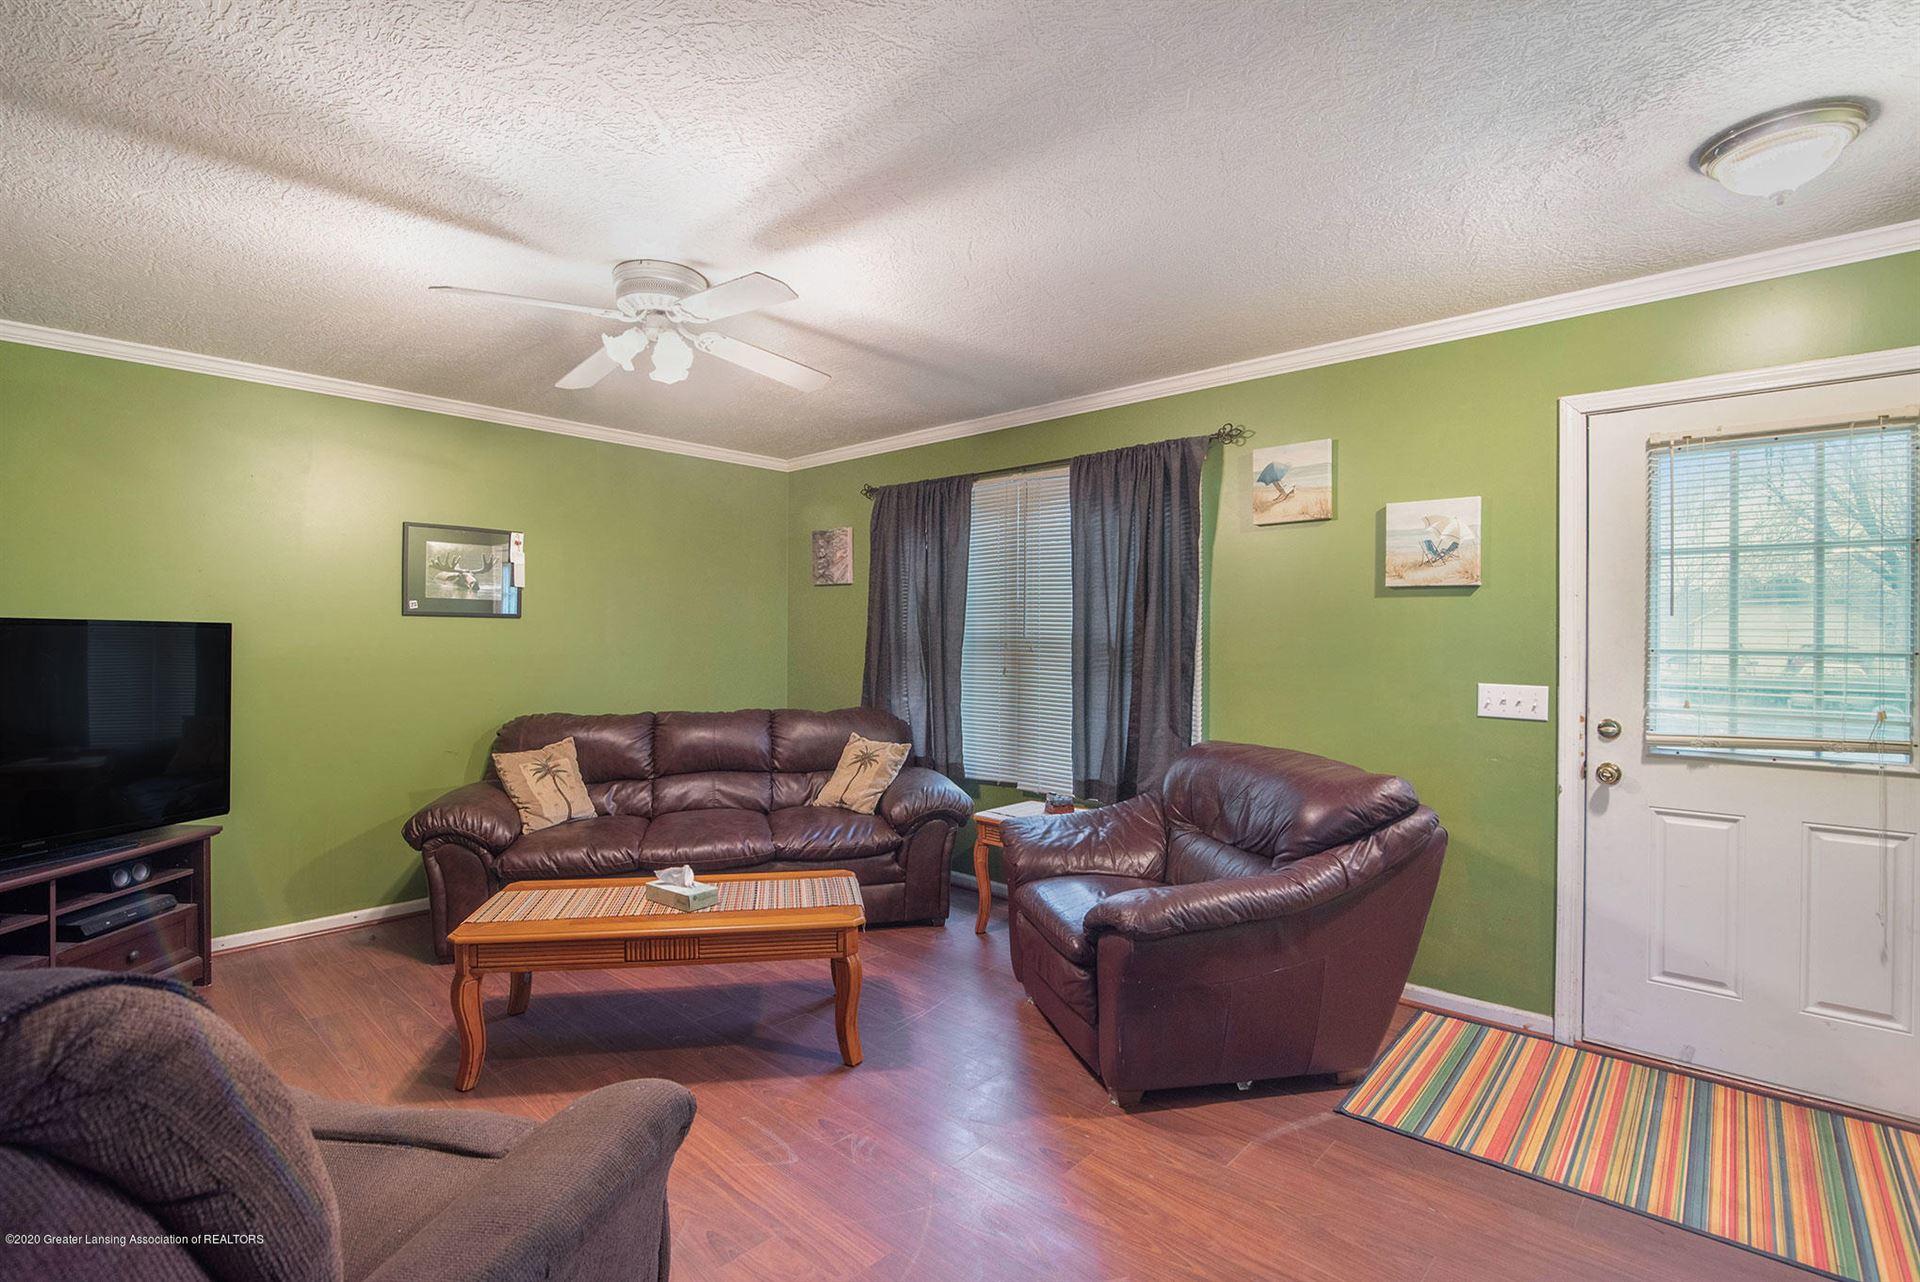 Photo of 616 Vaughn Street, Eaton Rapids, MI 48827 (MLS # 245306)